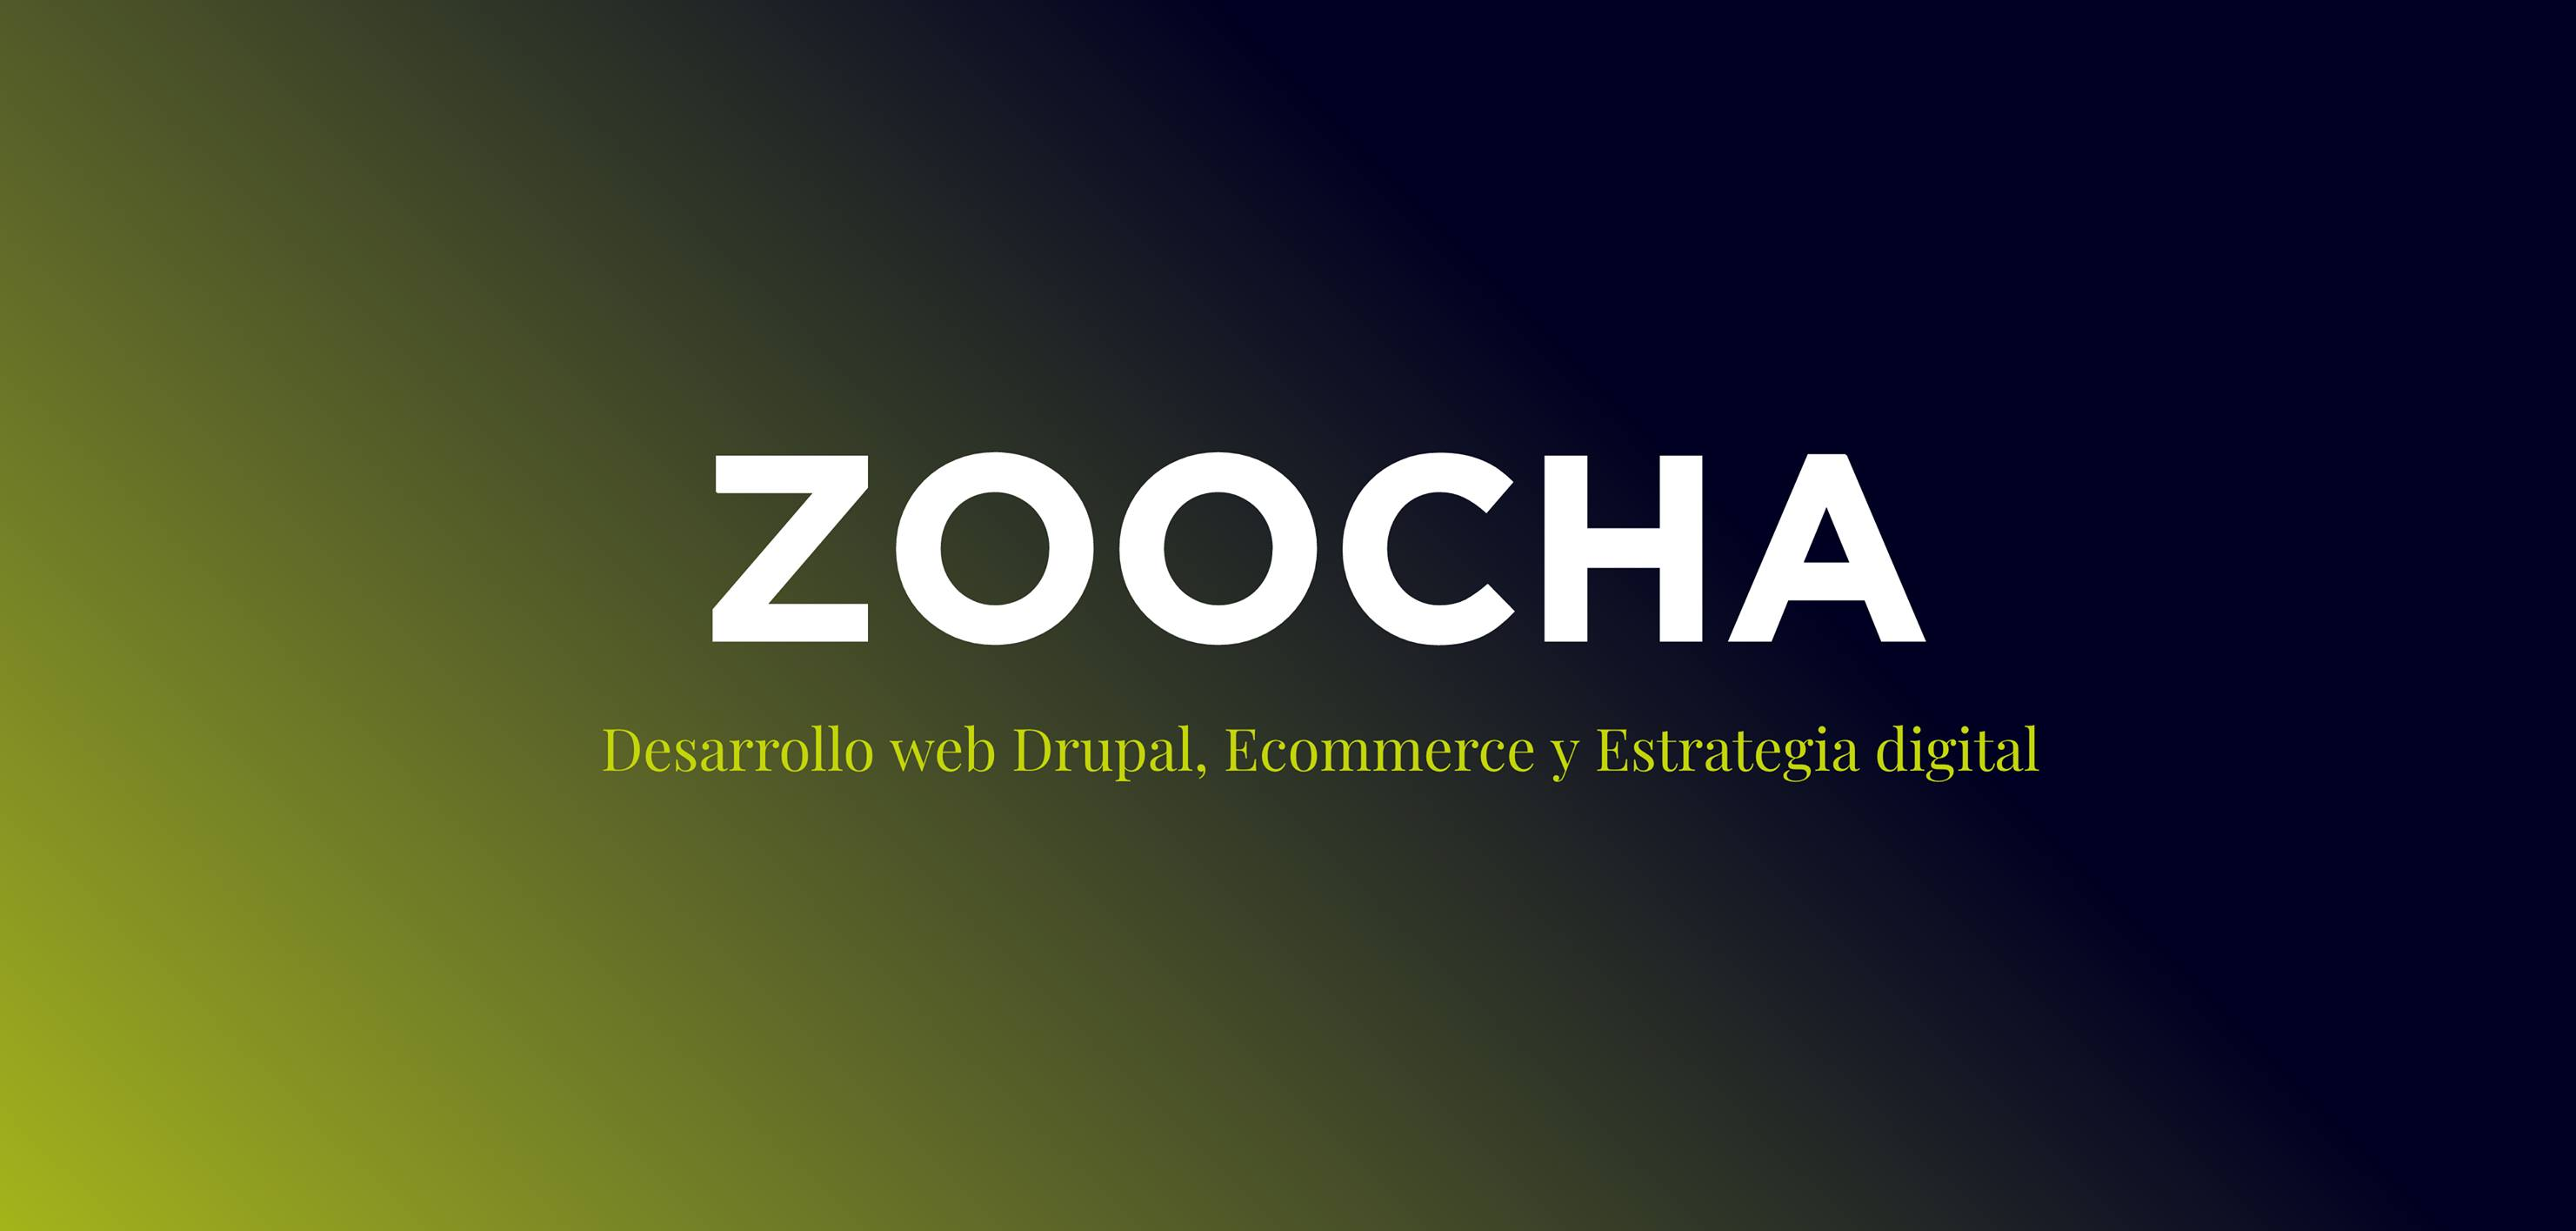 Zoocha Spain Logo